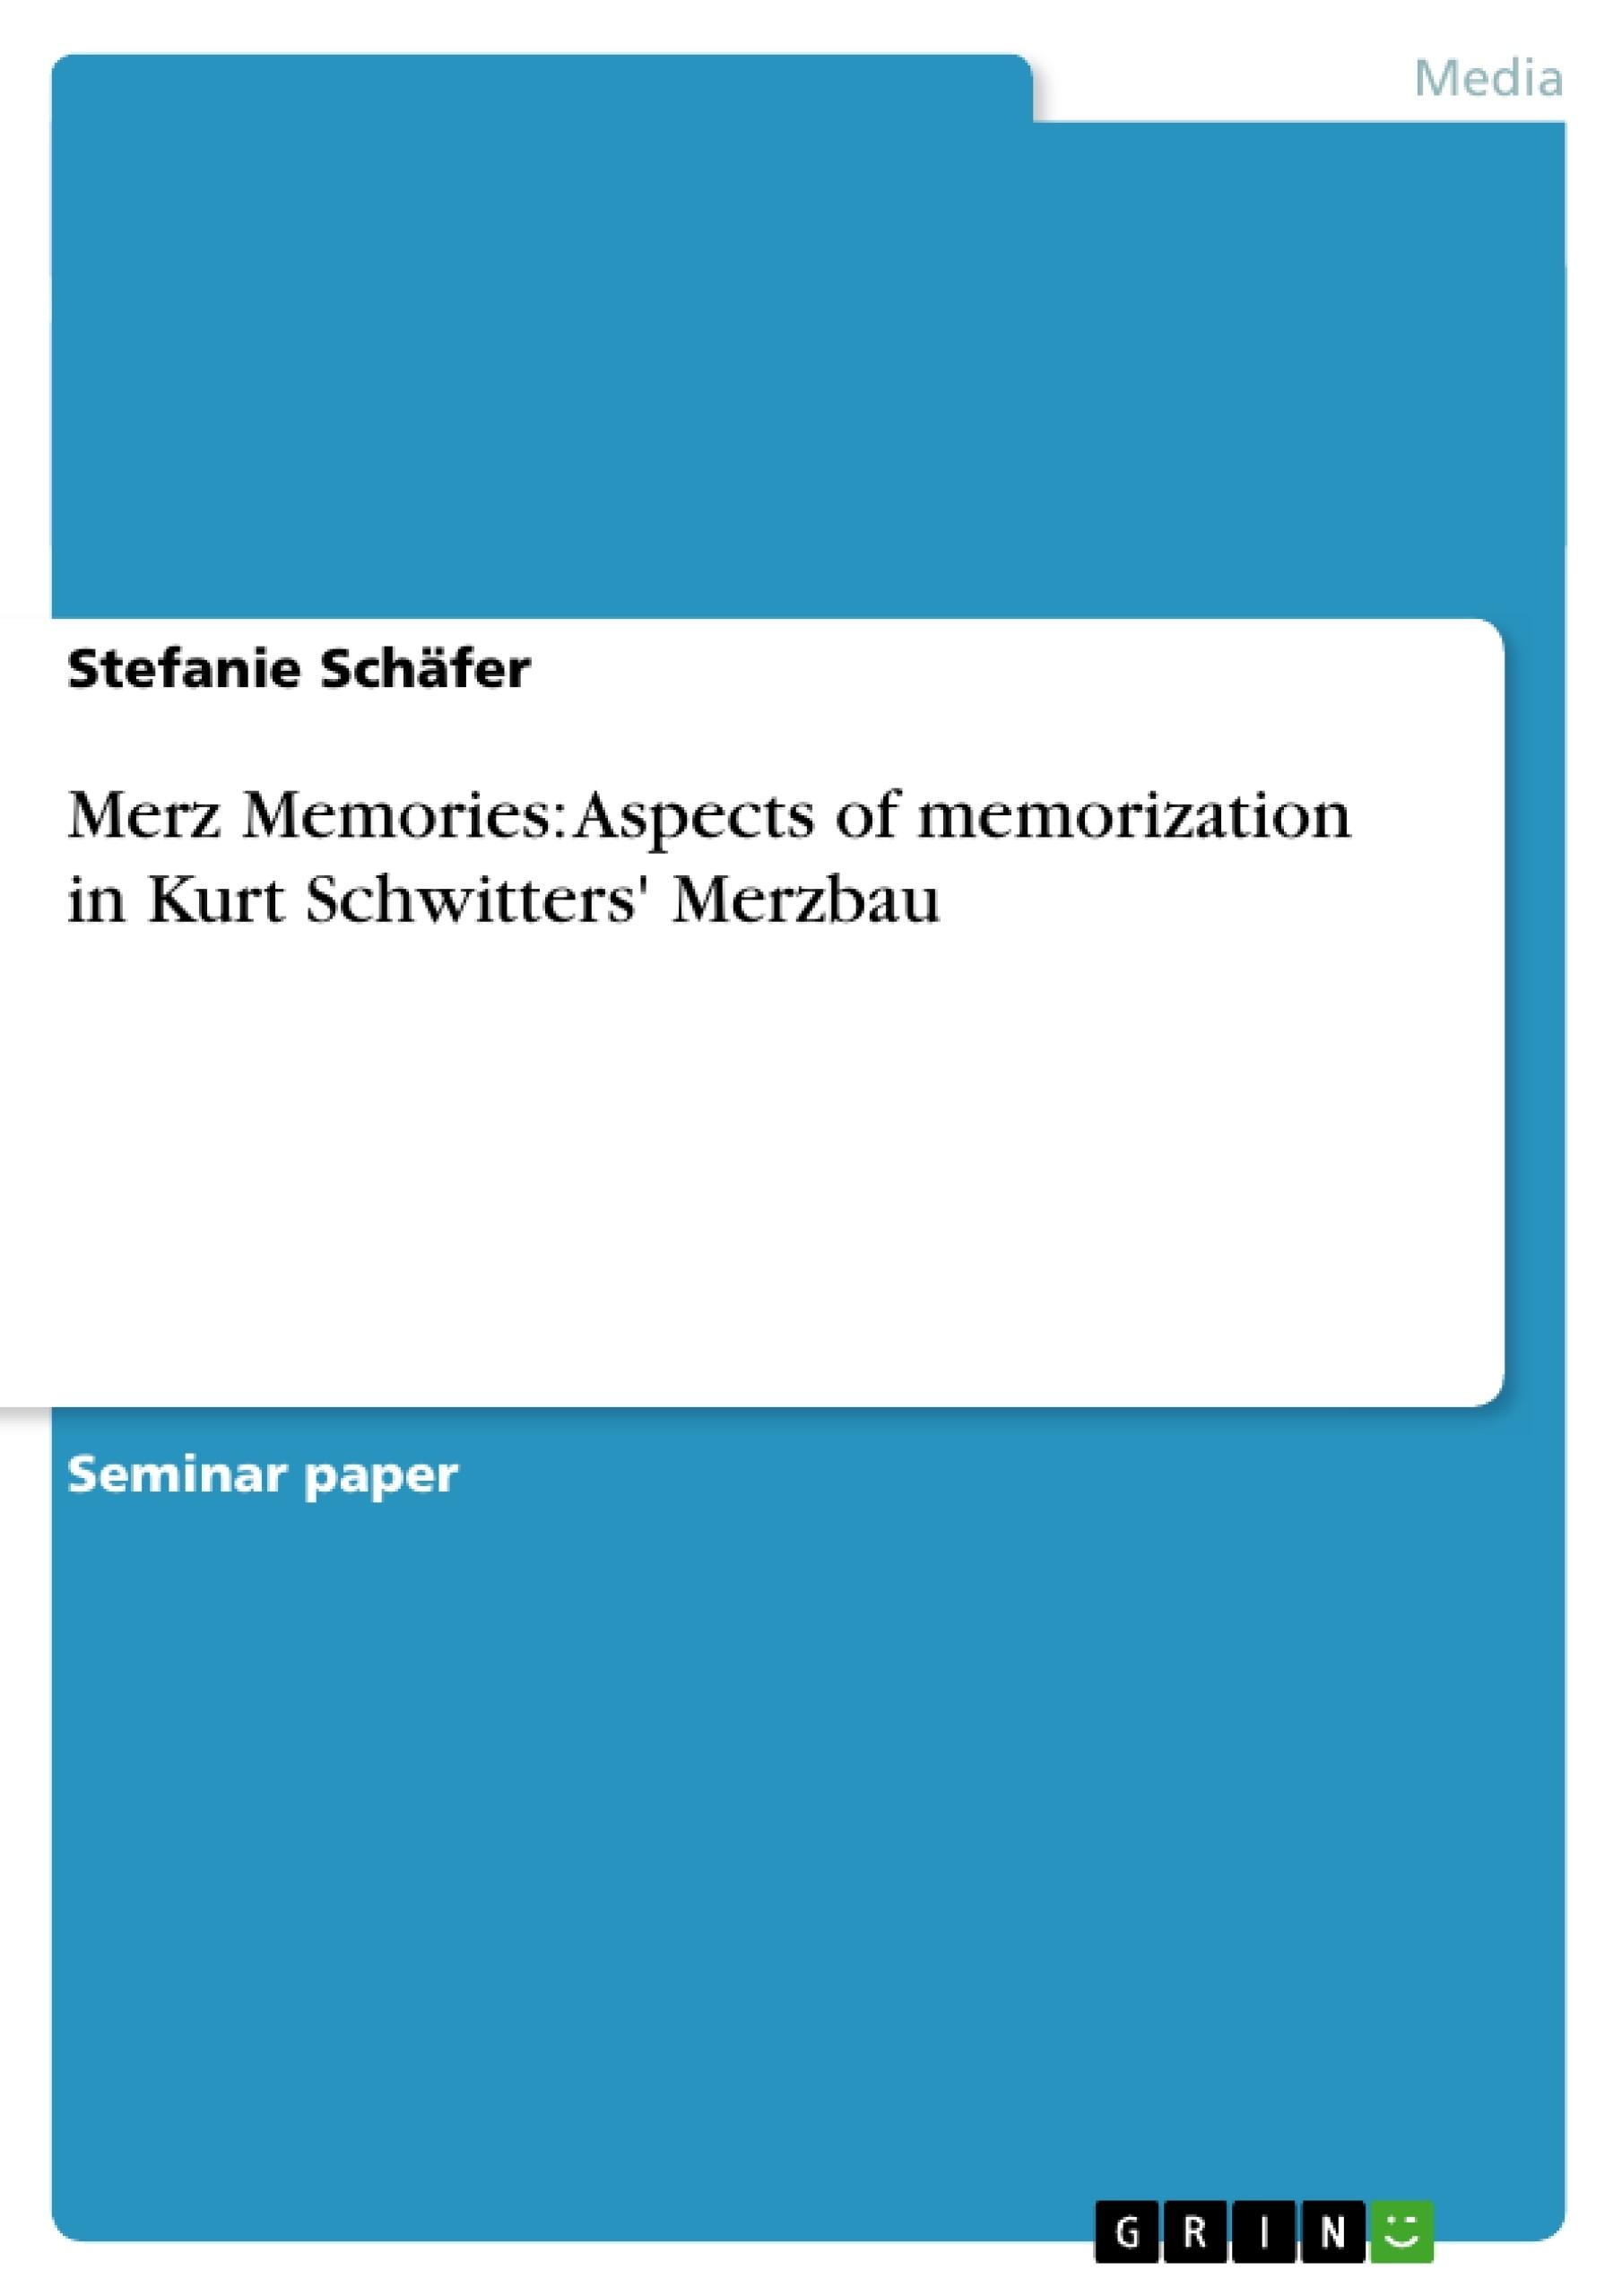 Title: Merz Memories: Aspects of memorization in Kurt Schwitters' Merzbau